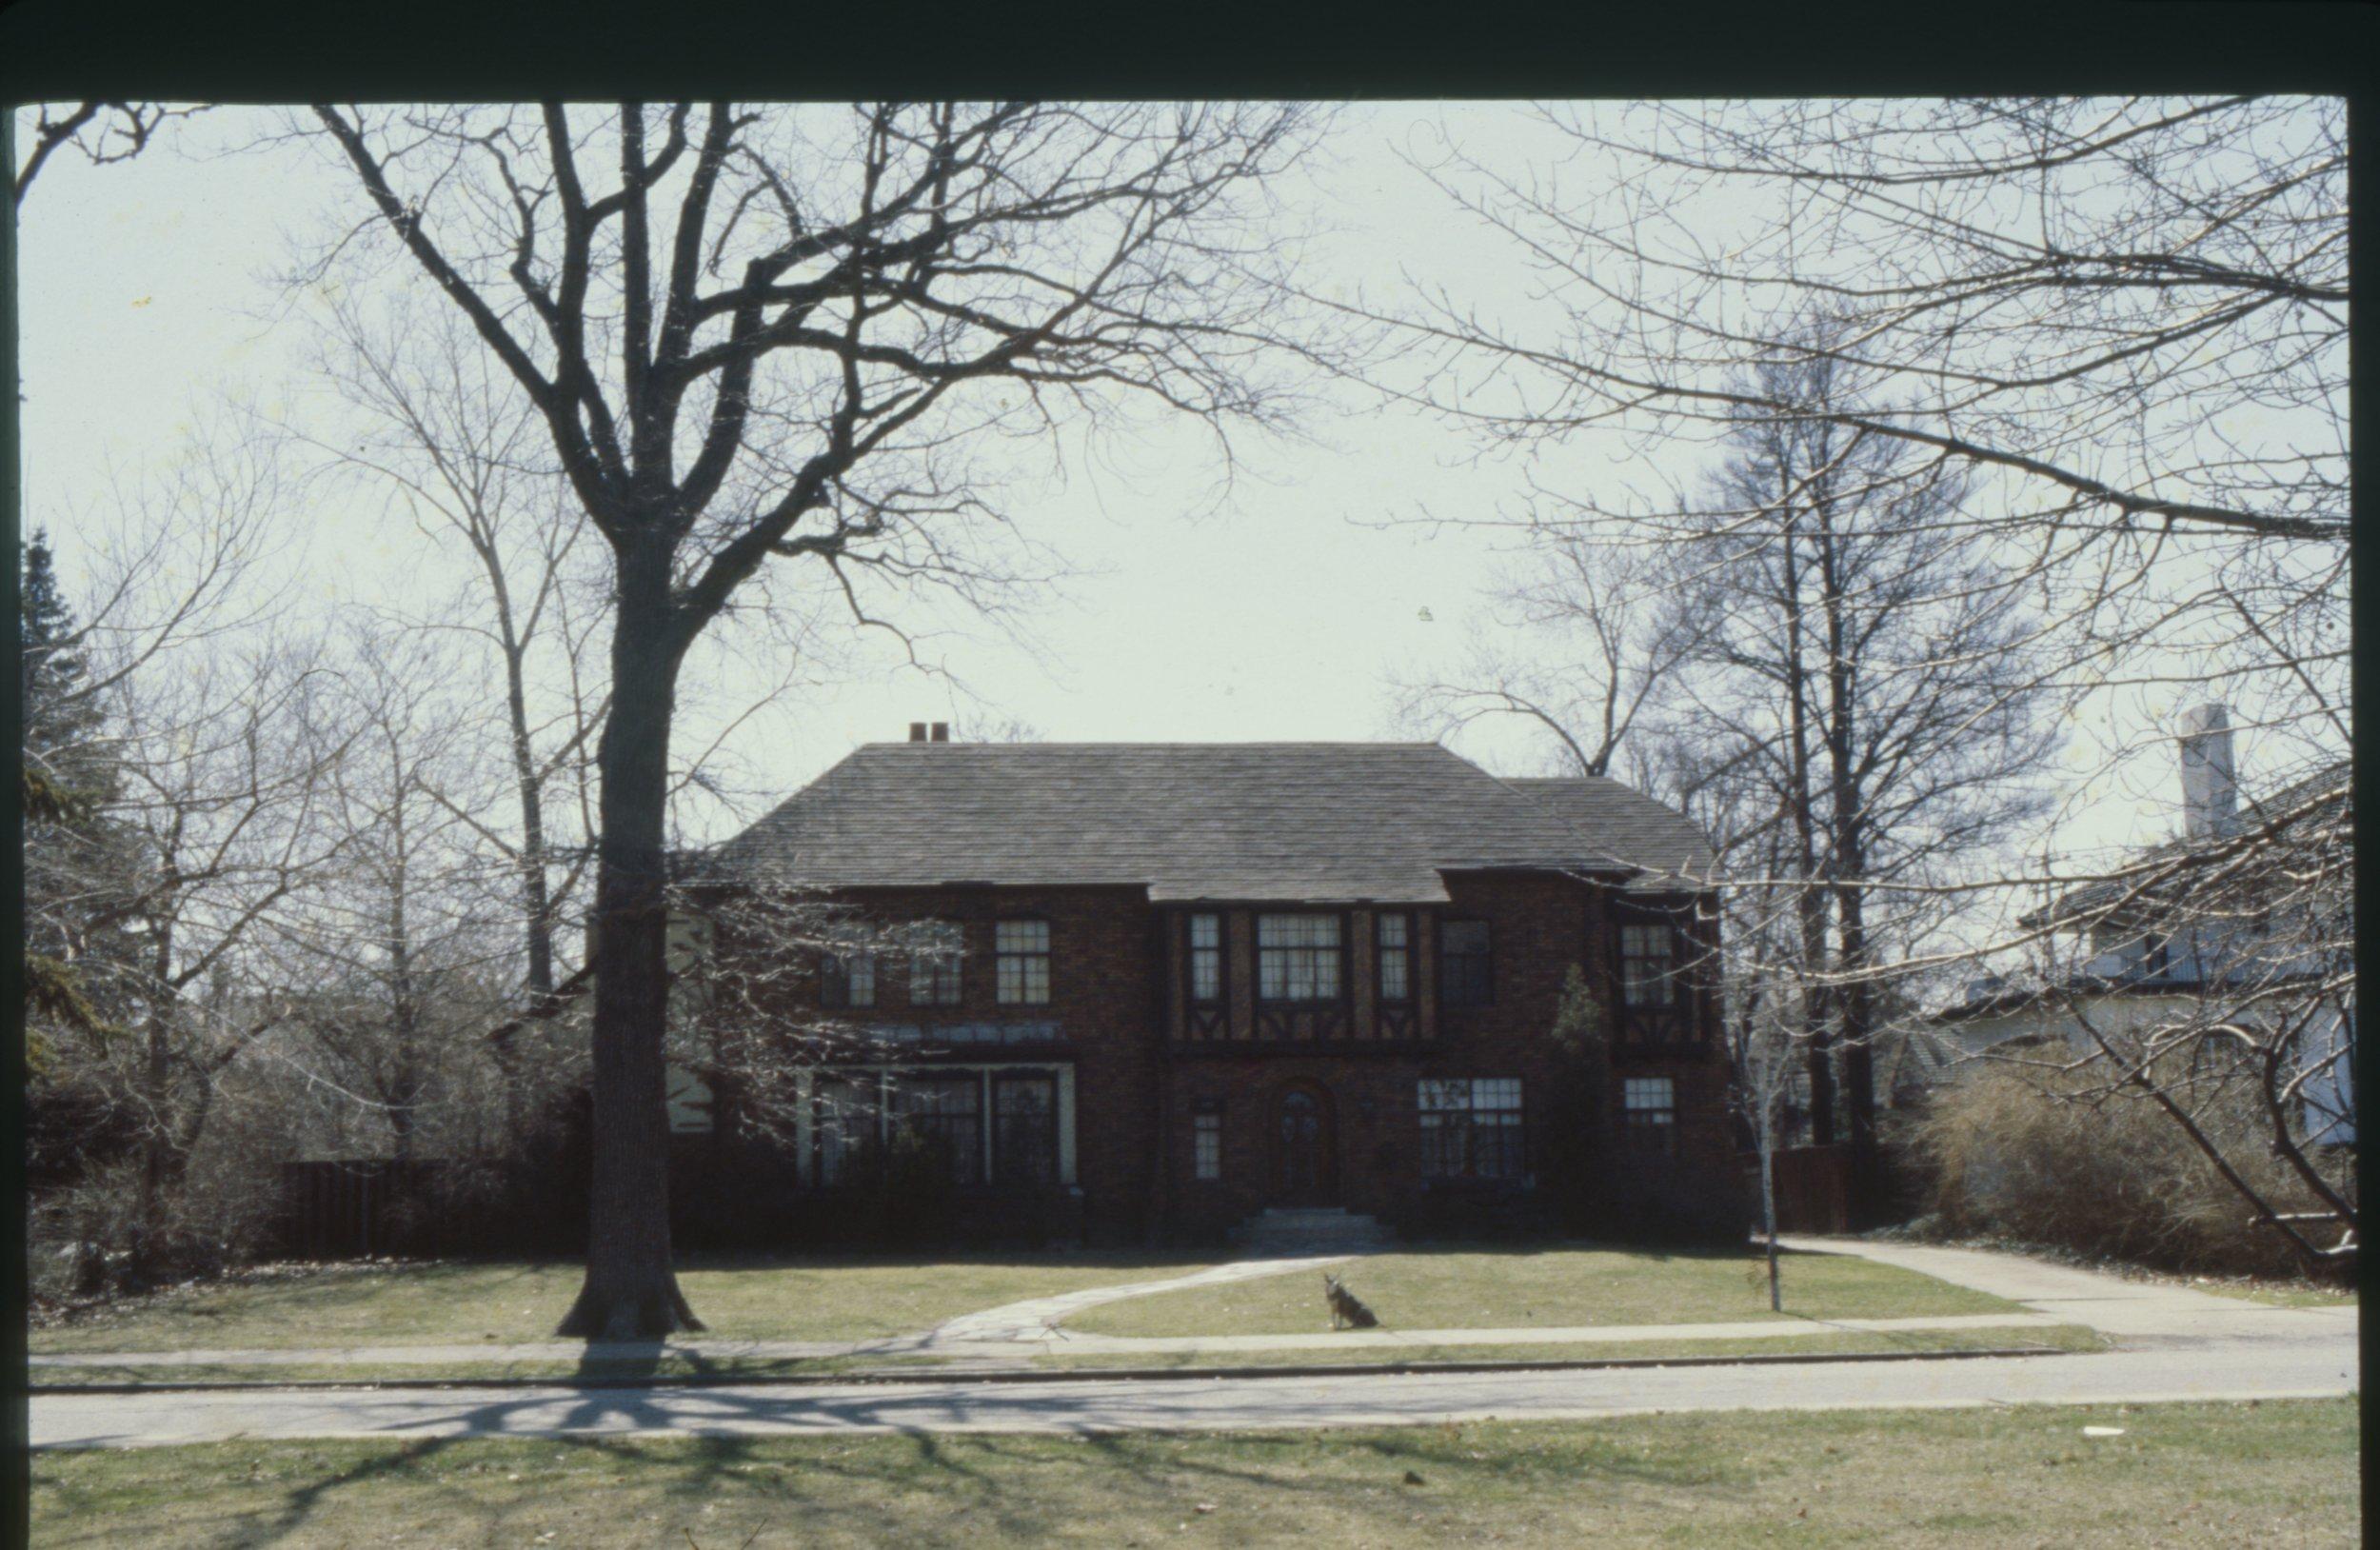 675 W. Boston 1980.jpg